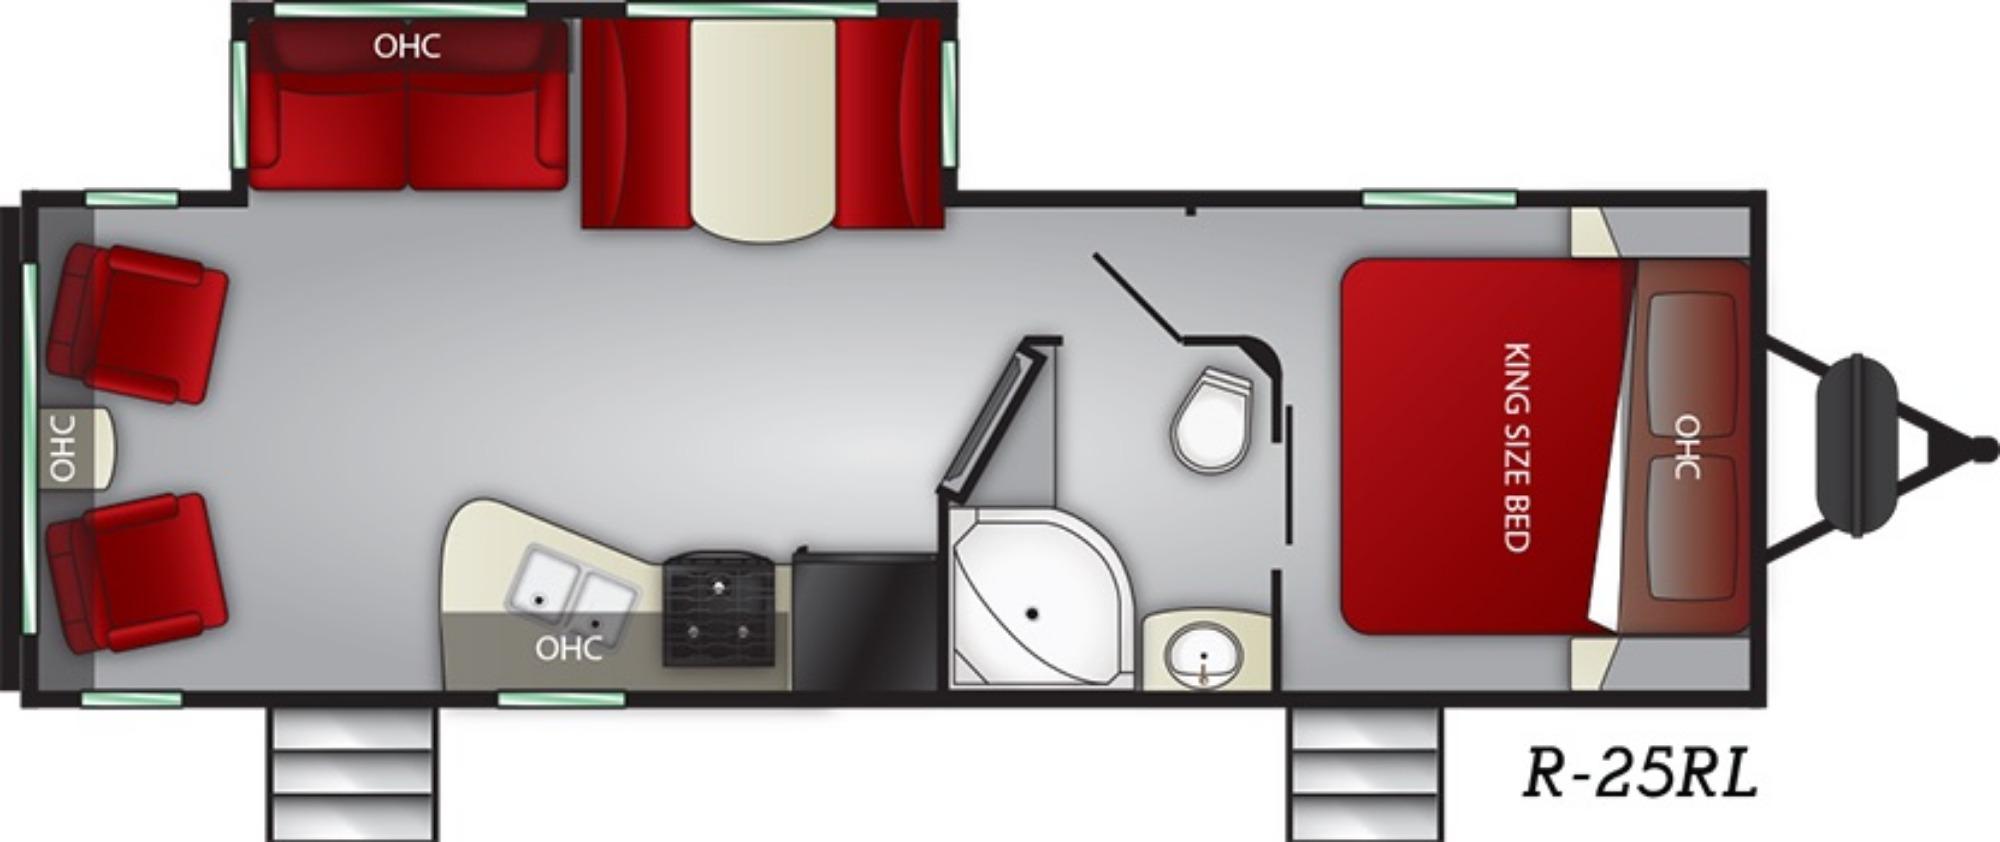 Exterior : 2019-CRUISER RV-25RL